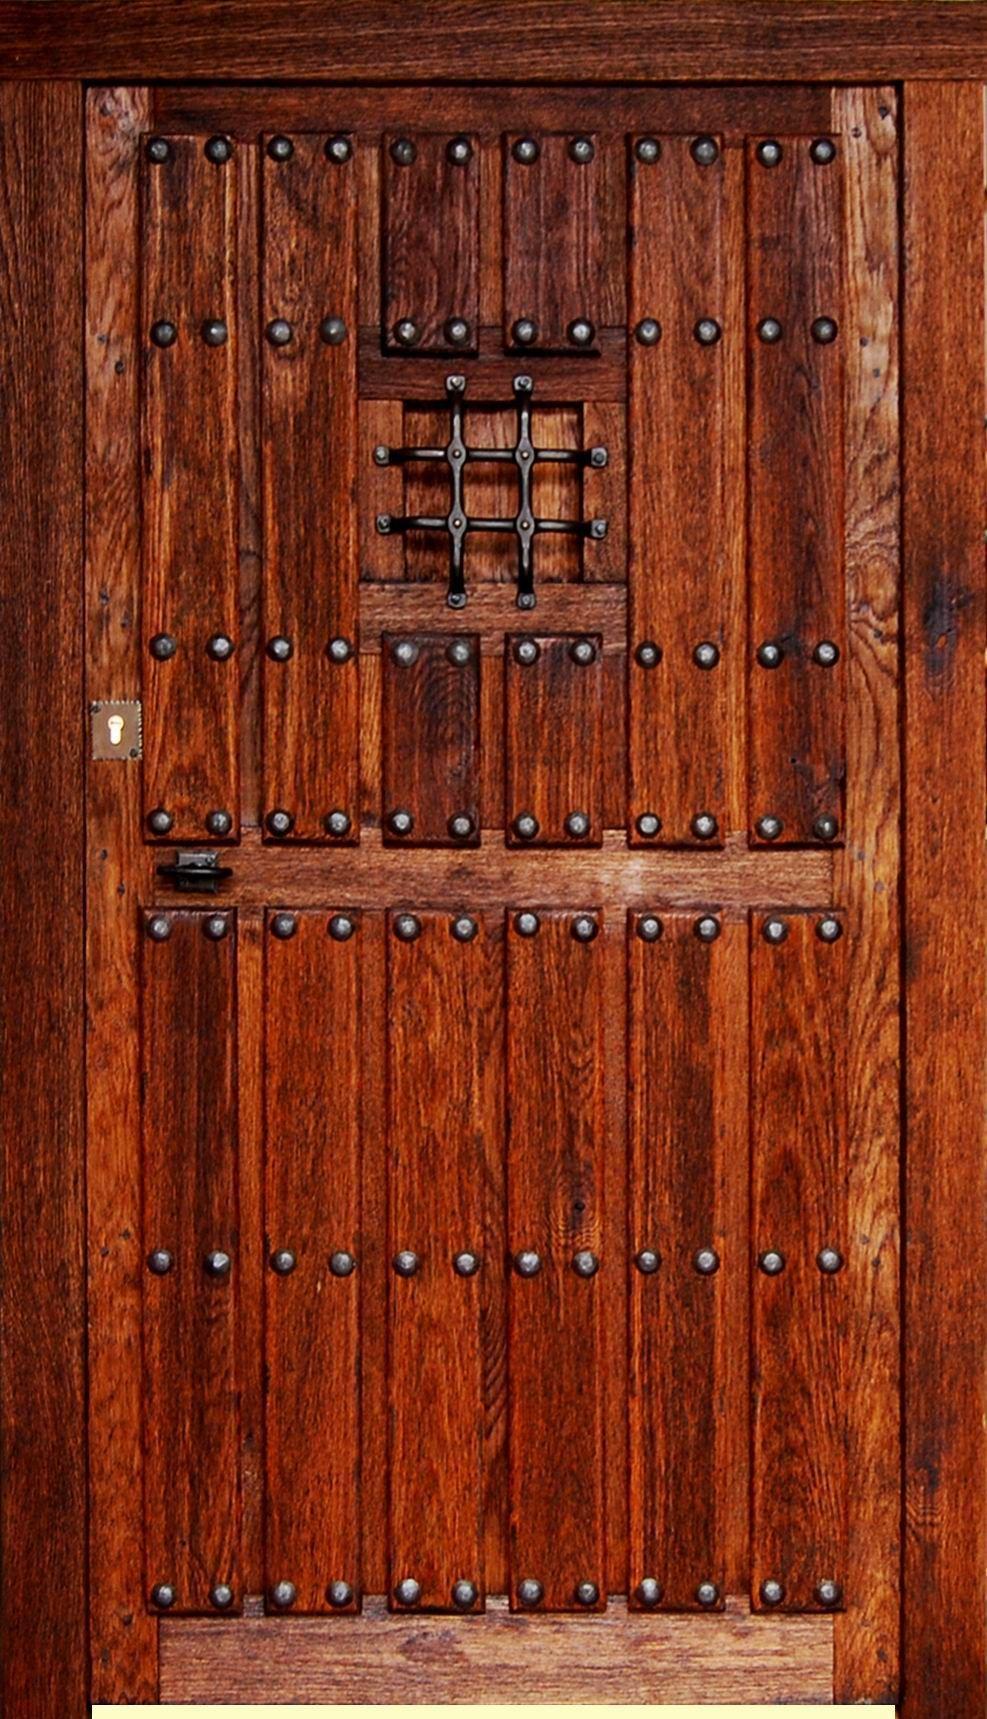 Puertas r sticas exterior buscar con google pinteres for Puertas rusticas exterior